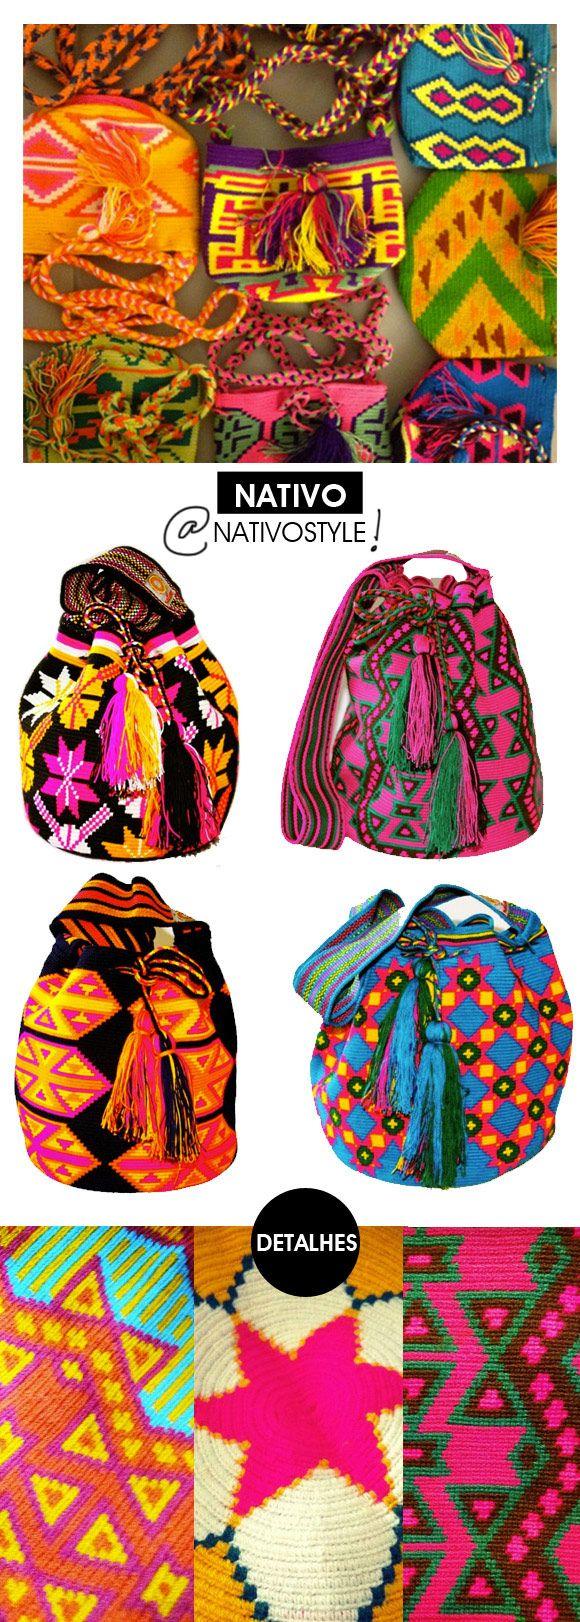 Achados da Bia | Acessório | Bolsa étnica | Nativo Style | Miss Mochila